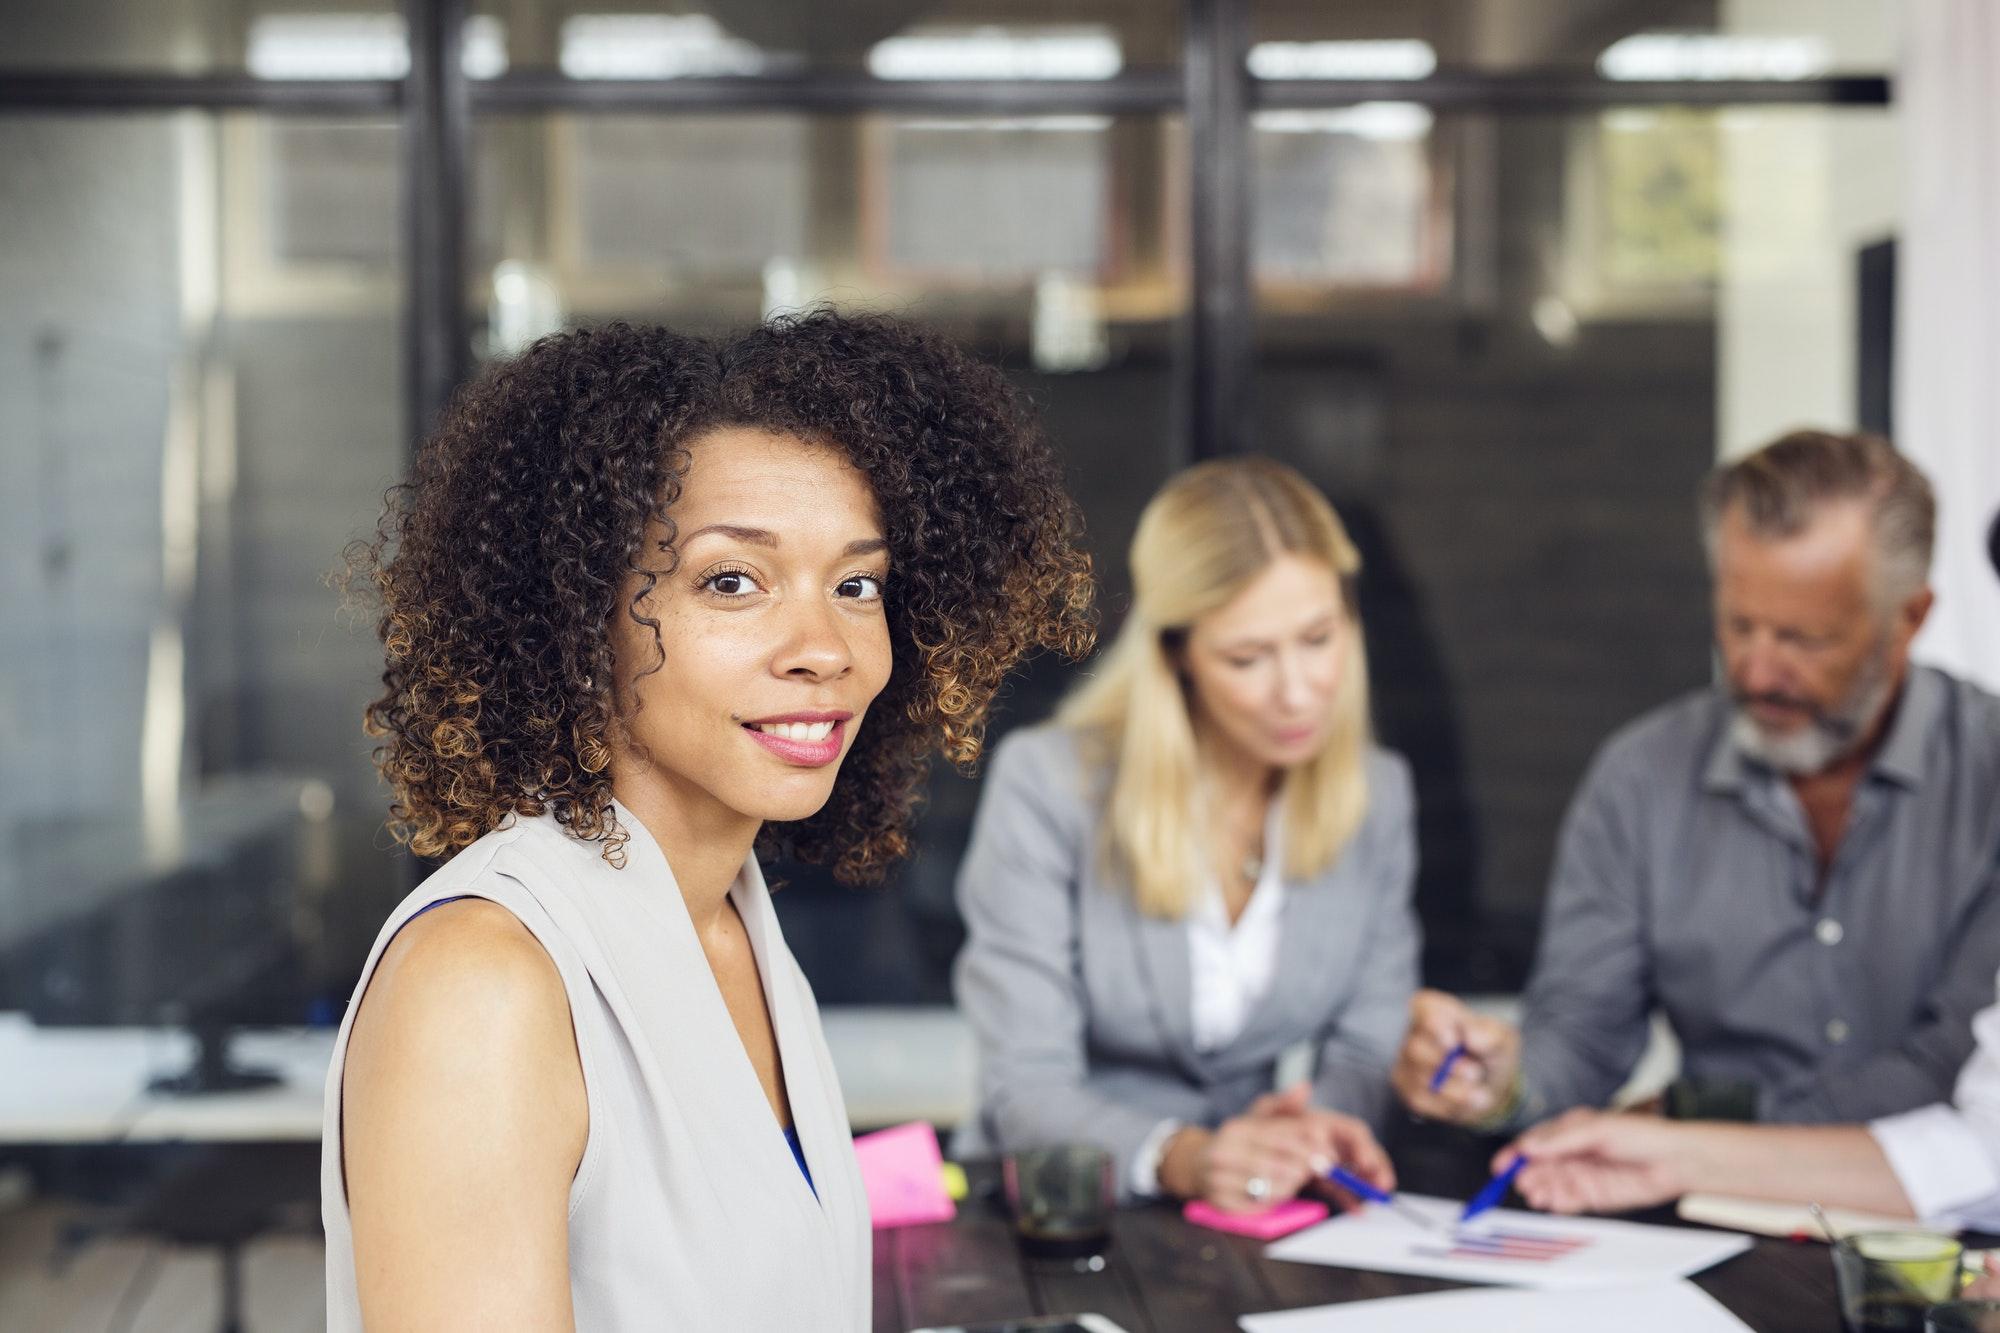 Portrait of brunette woman, Business people working in office in background